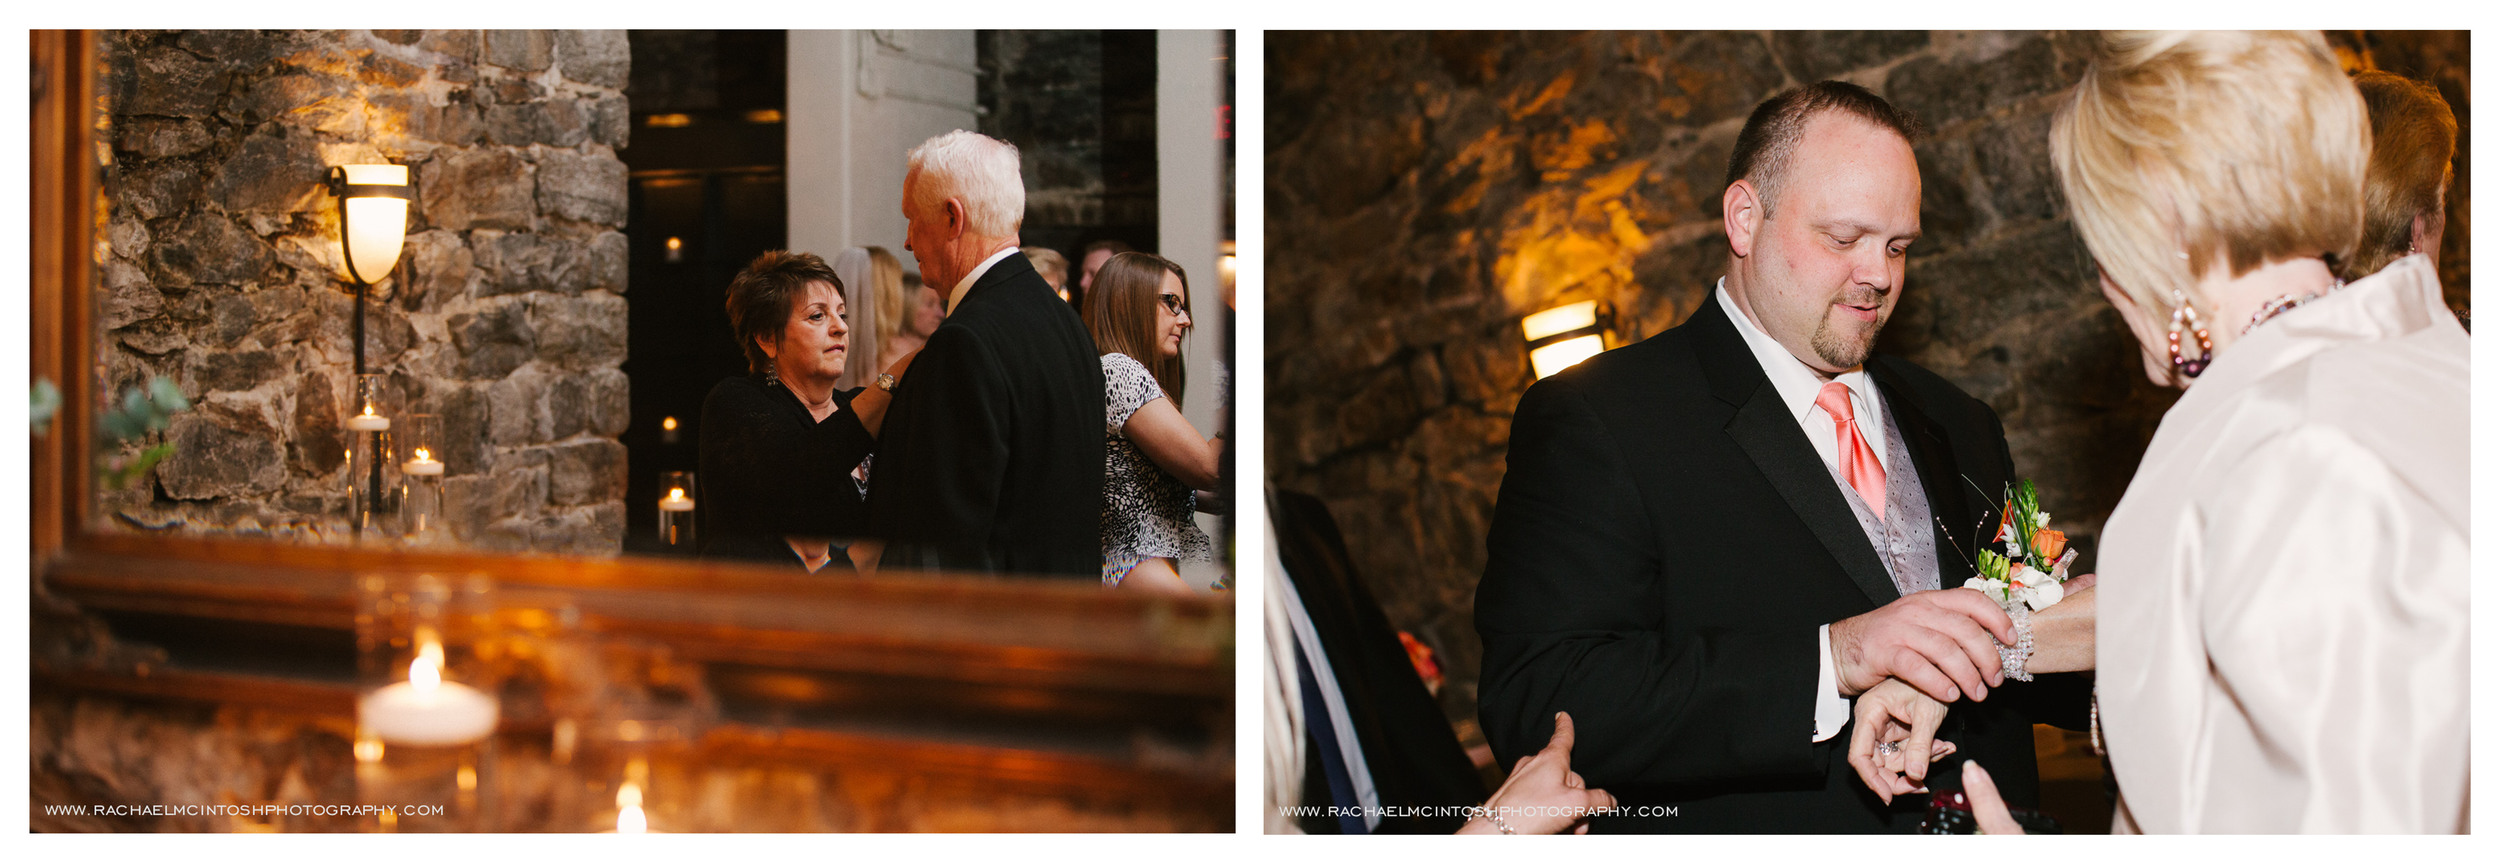 Biltmore champagne Cellar Ceremony 1.jpg